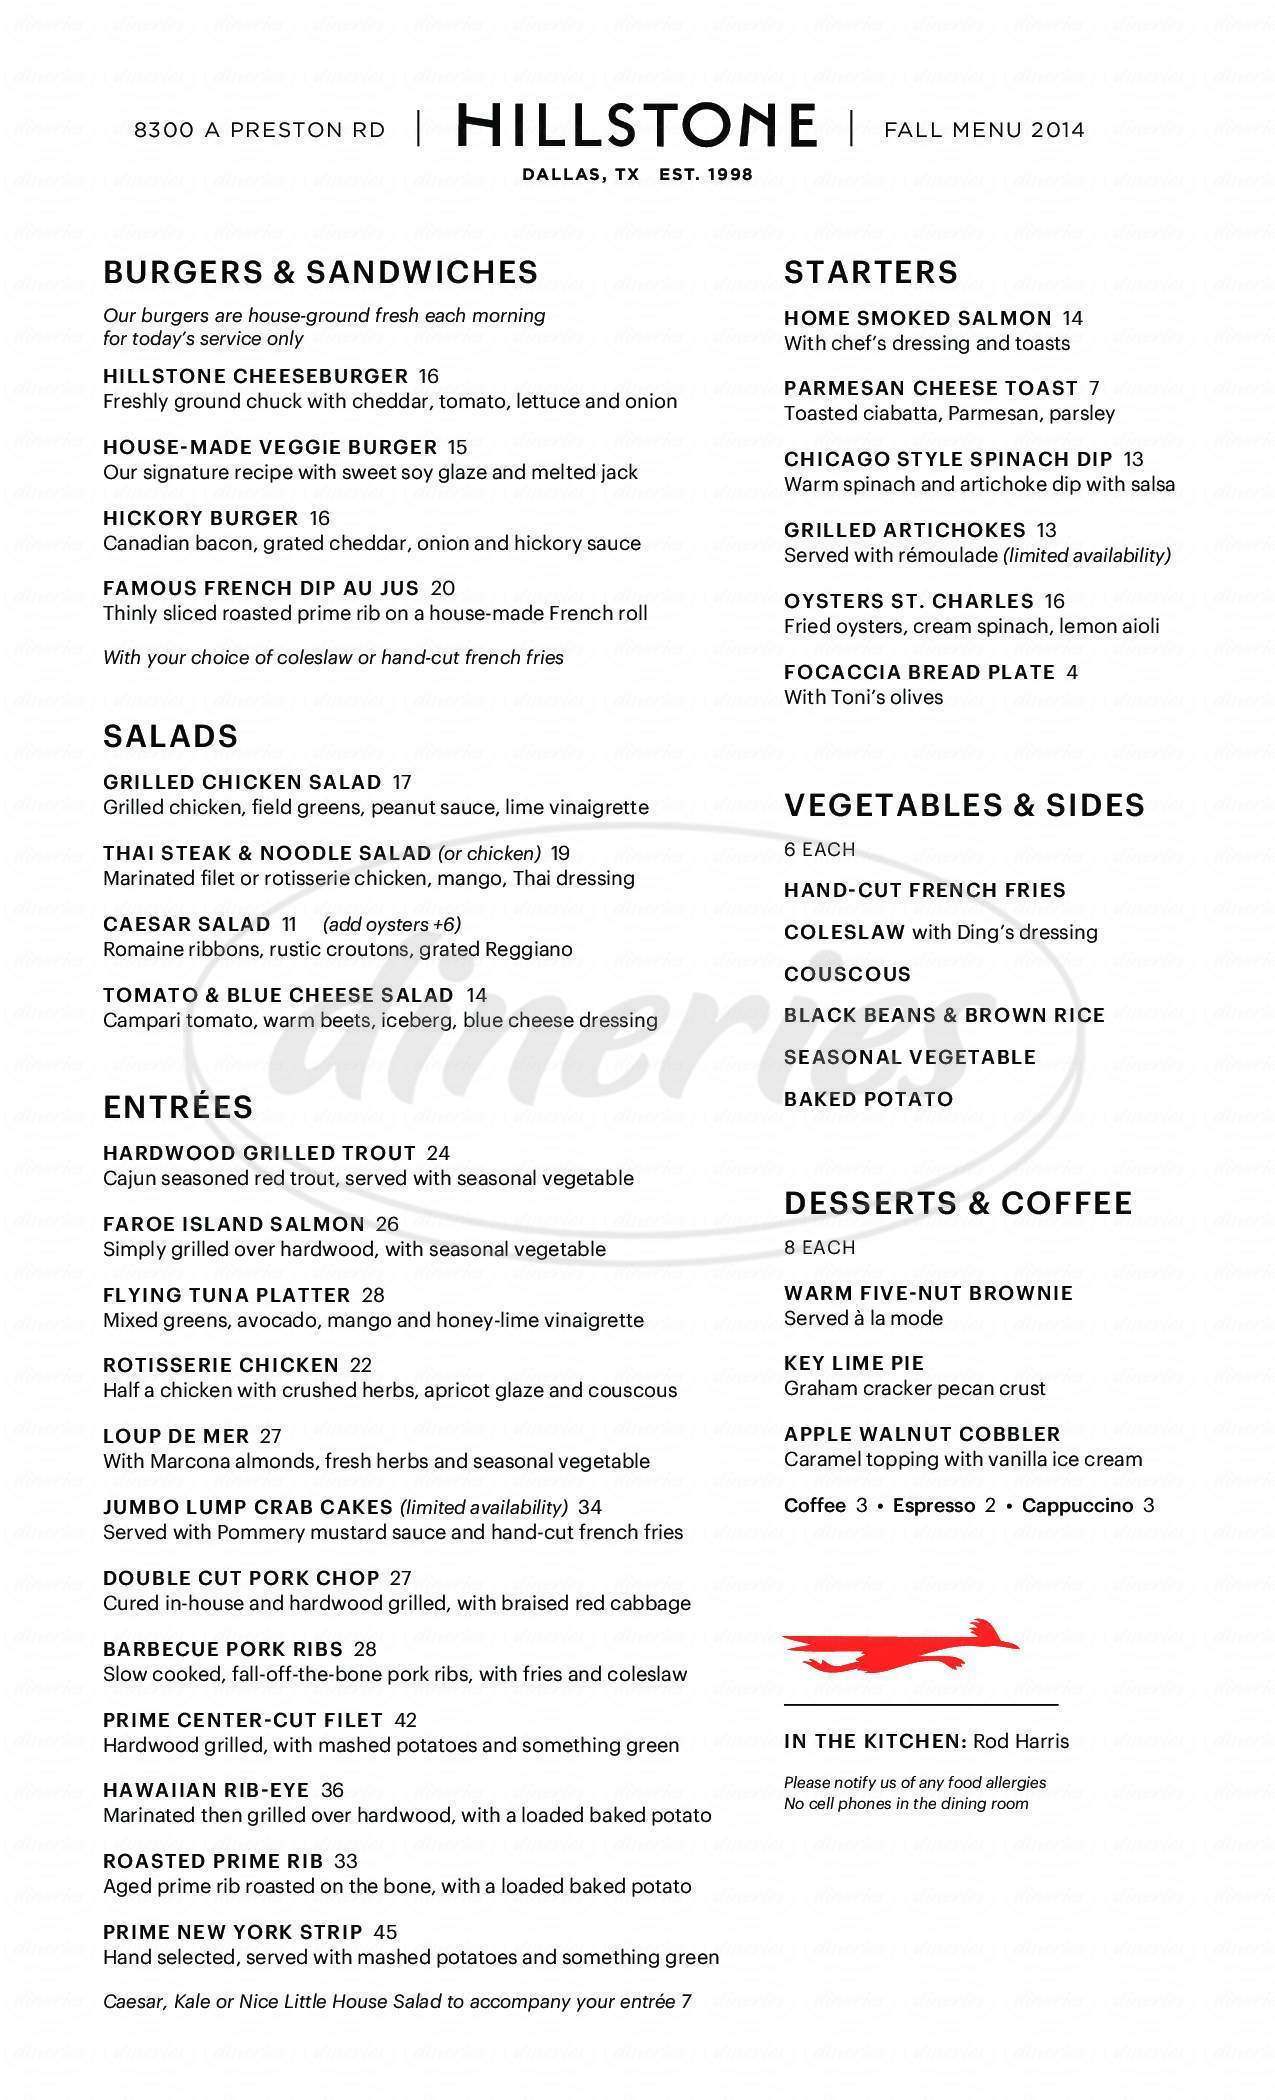 menu for Hillstone